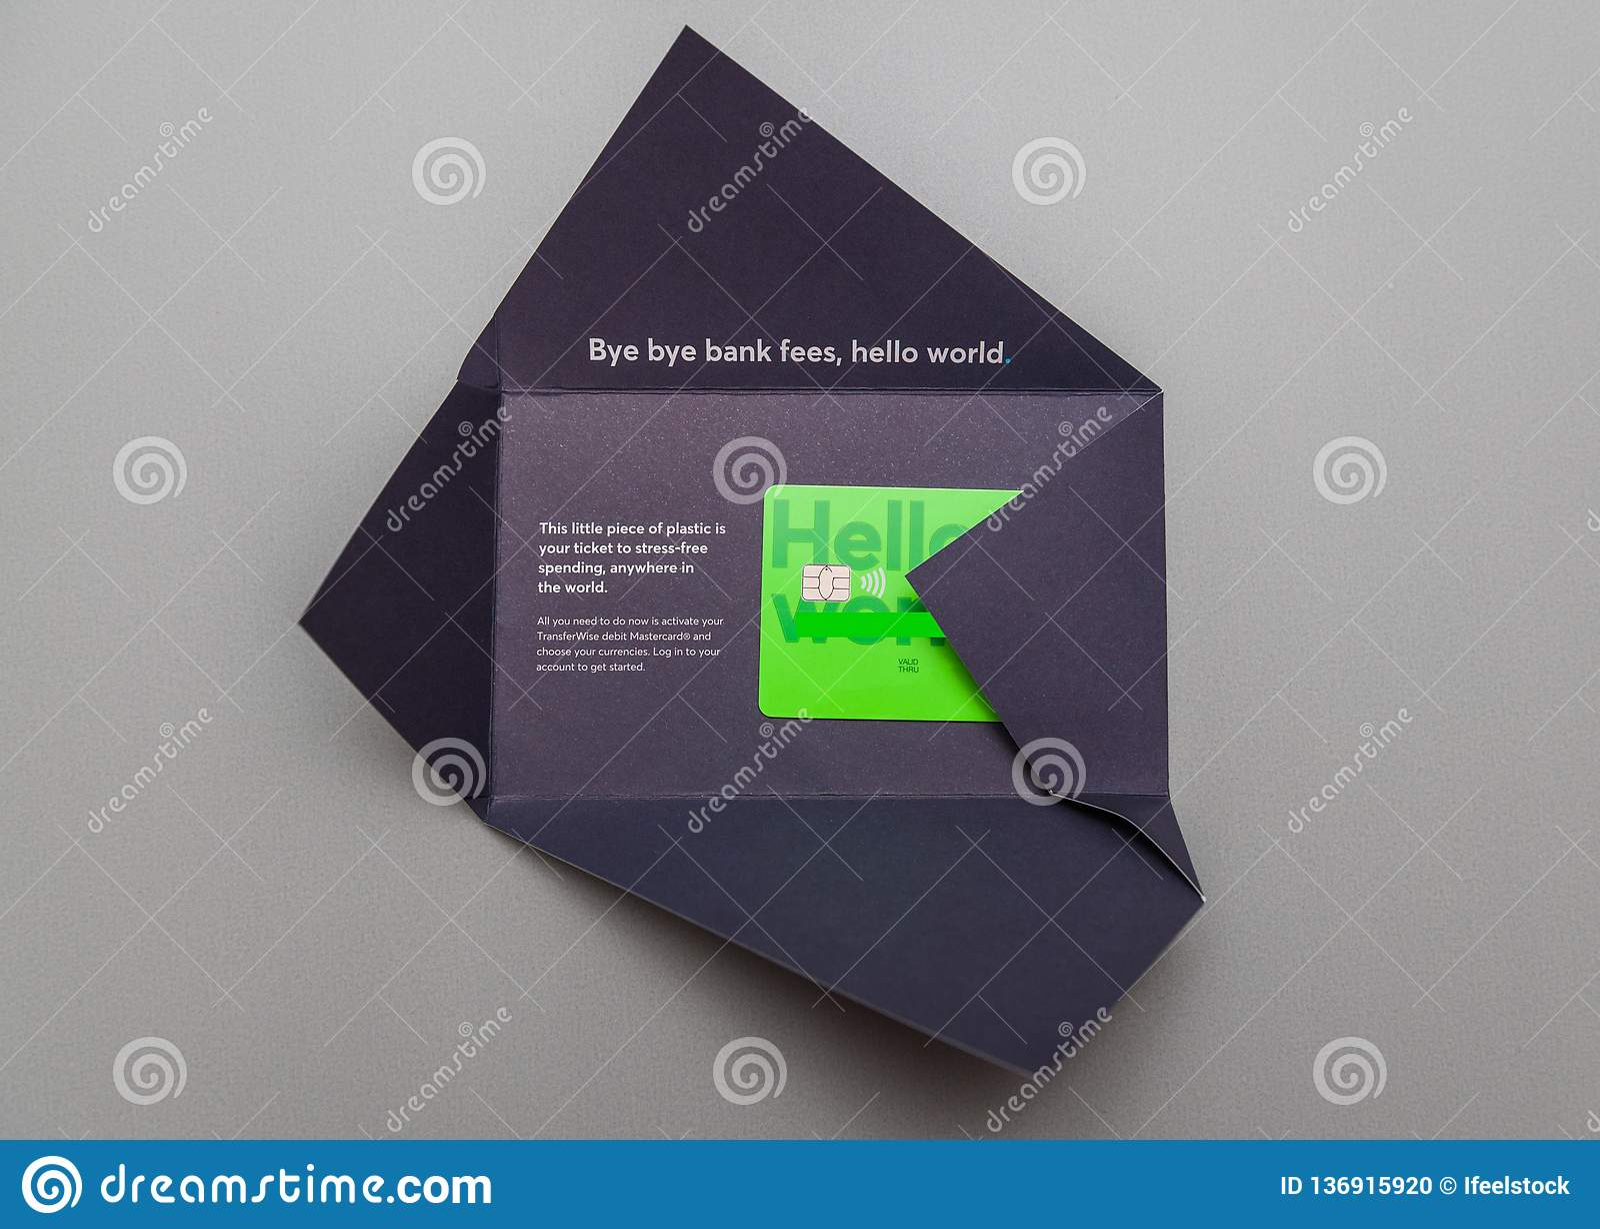 Presentation New TransferWise Mastercard Banking Card